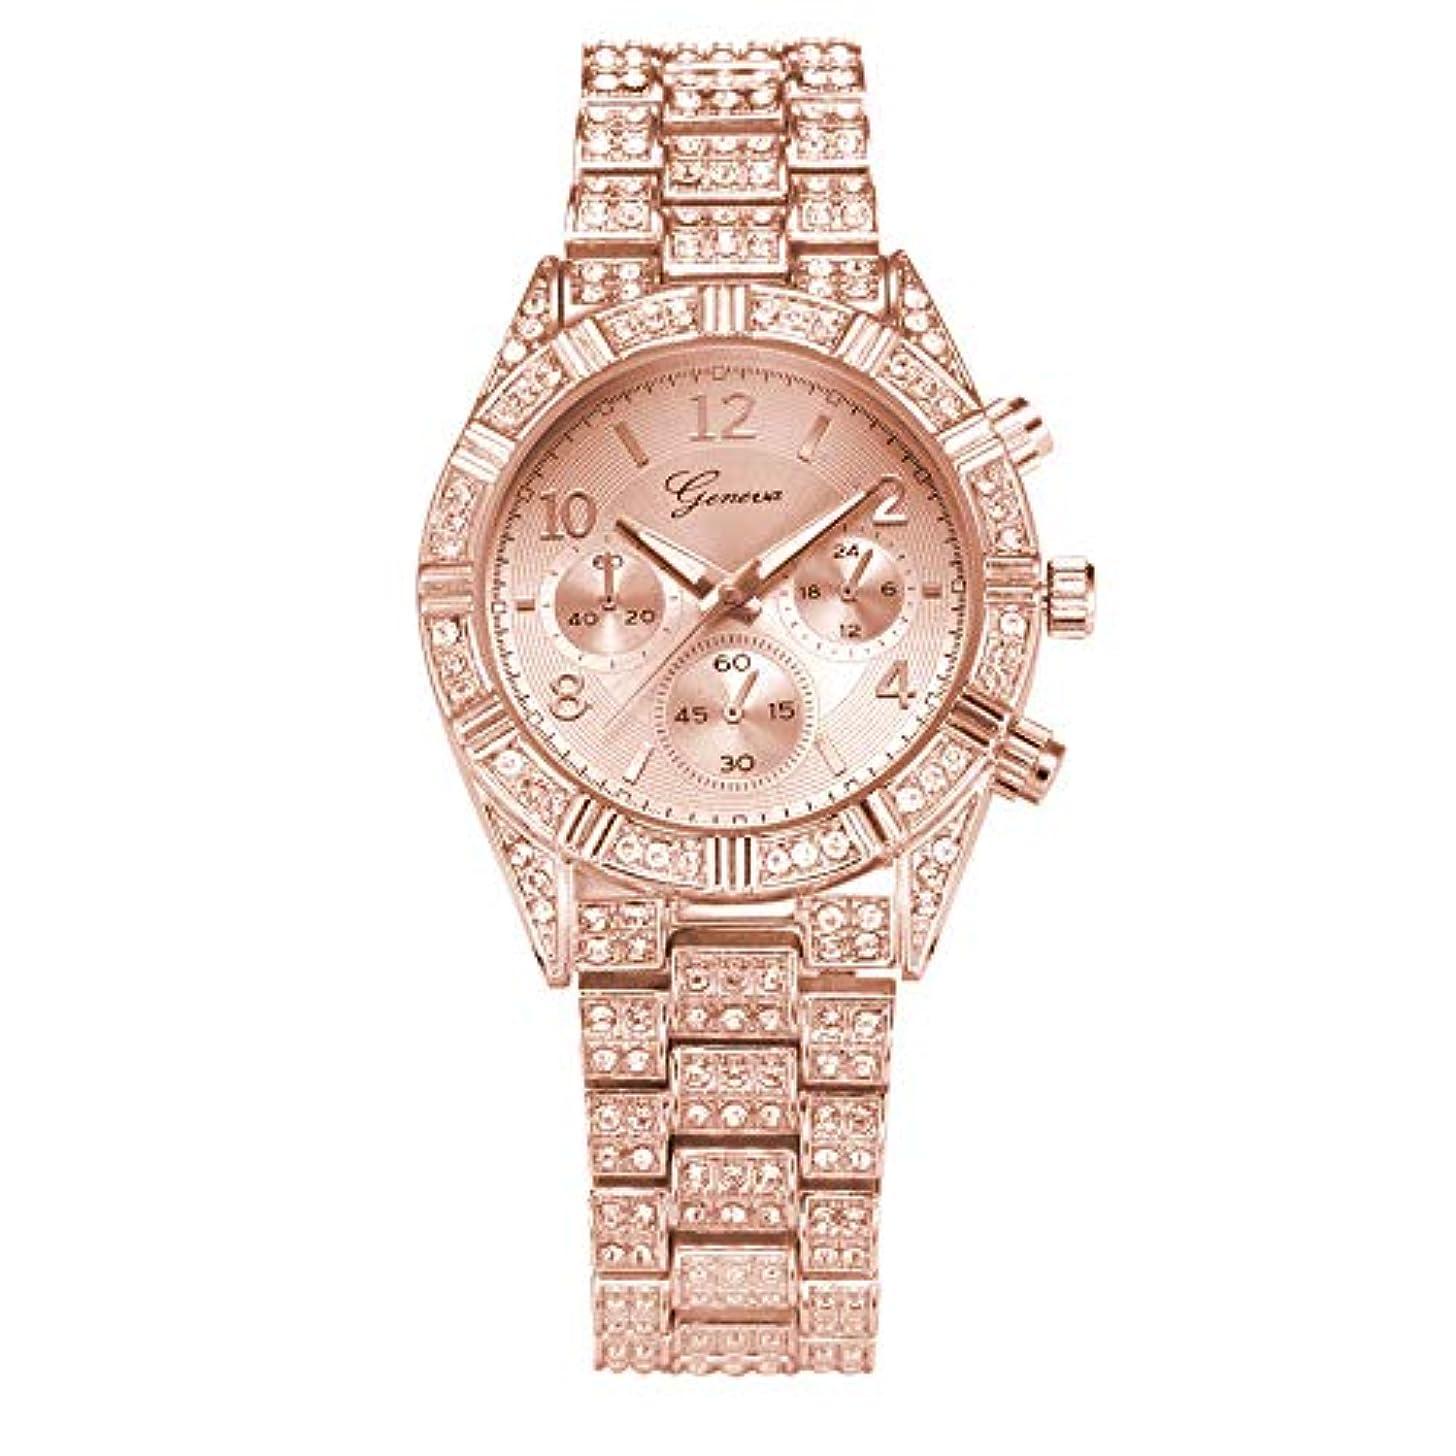 Women Watches for Sale,2019 Summer Deals! Fashion Stainless Steel Geneva Women Crystal Quartz Analog Wrist Watch(Rose Gold)